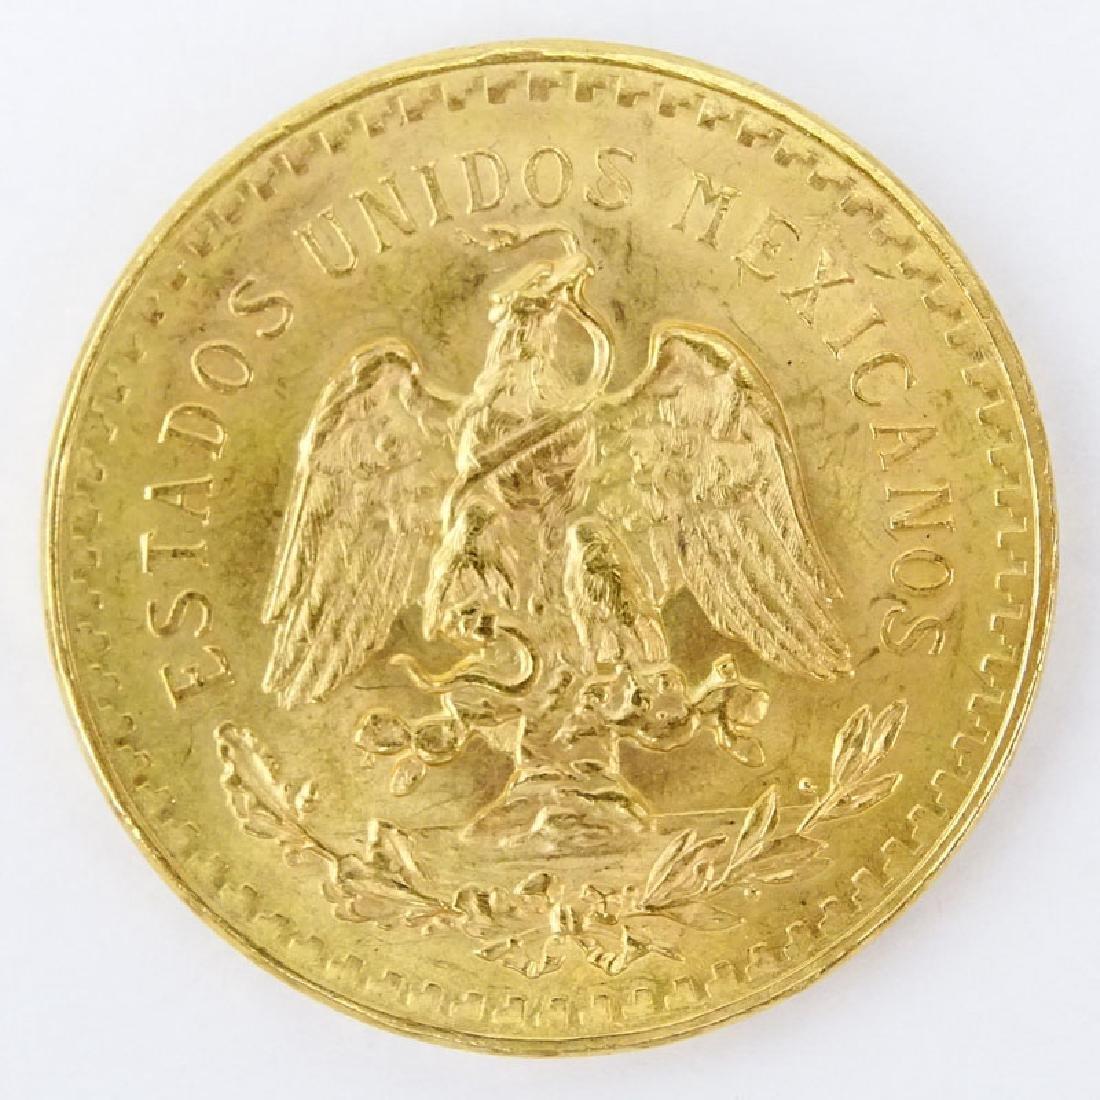 1821-1947 Mexican 50 Pesos Gold Coin. Approx. 41.8 - 2